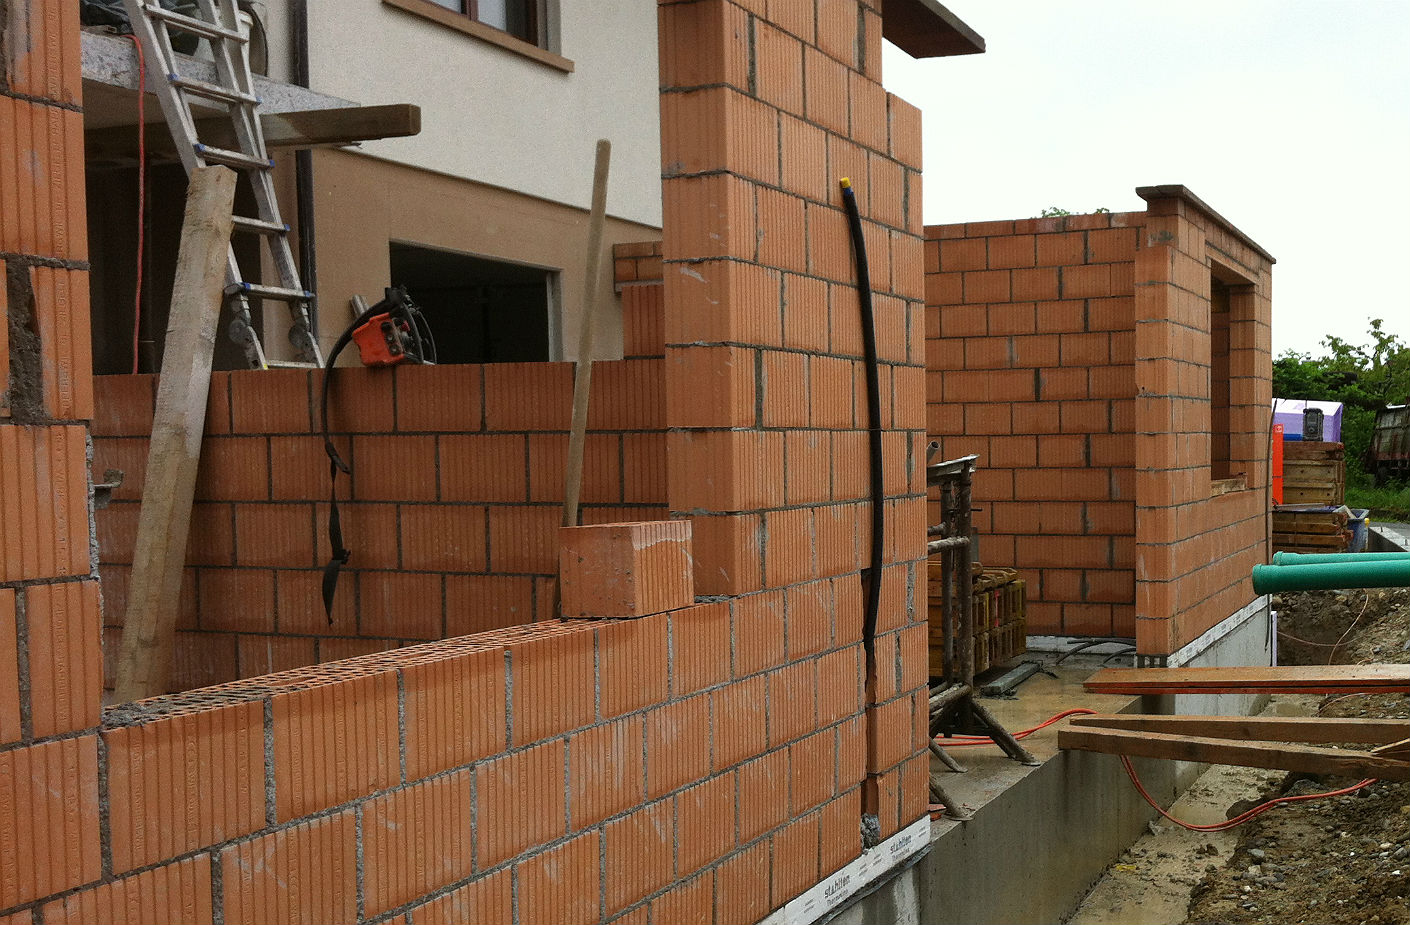 Umbau/Anbau Einfamilienhaus